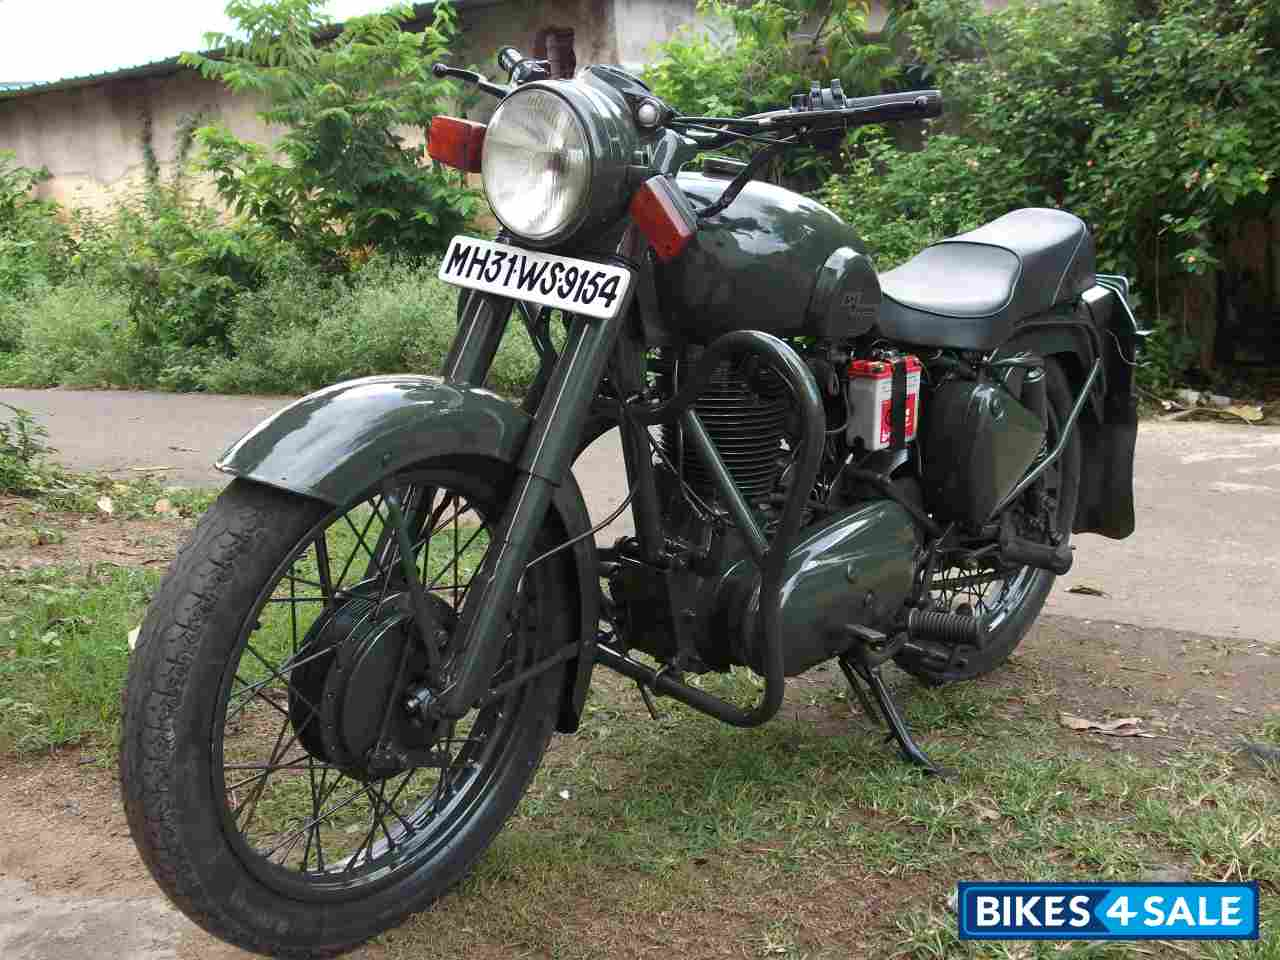 7e7e6655c40 Ray Ban India Price List Bangalore